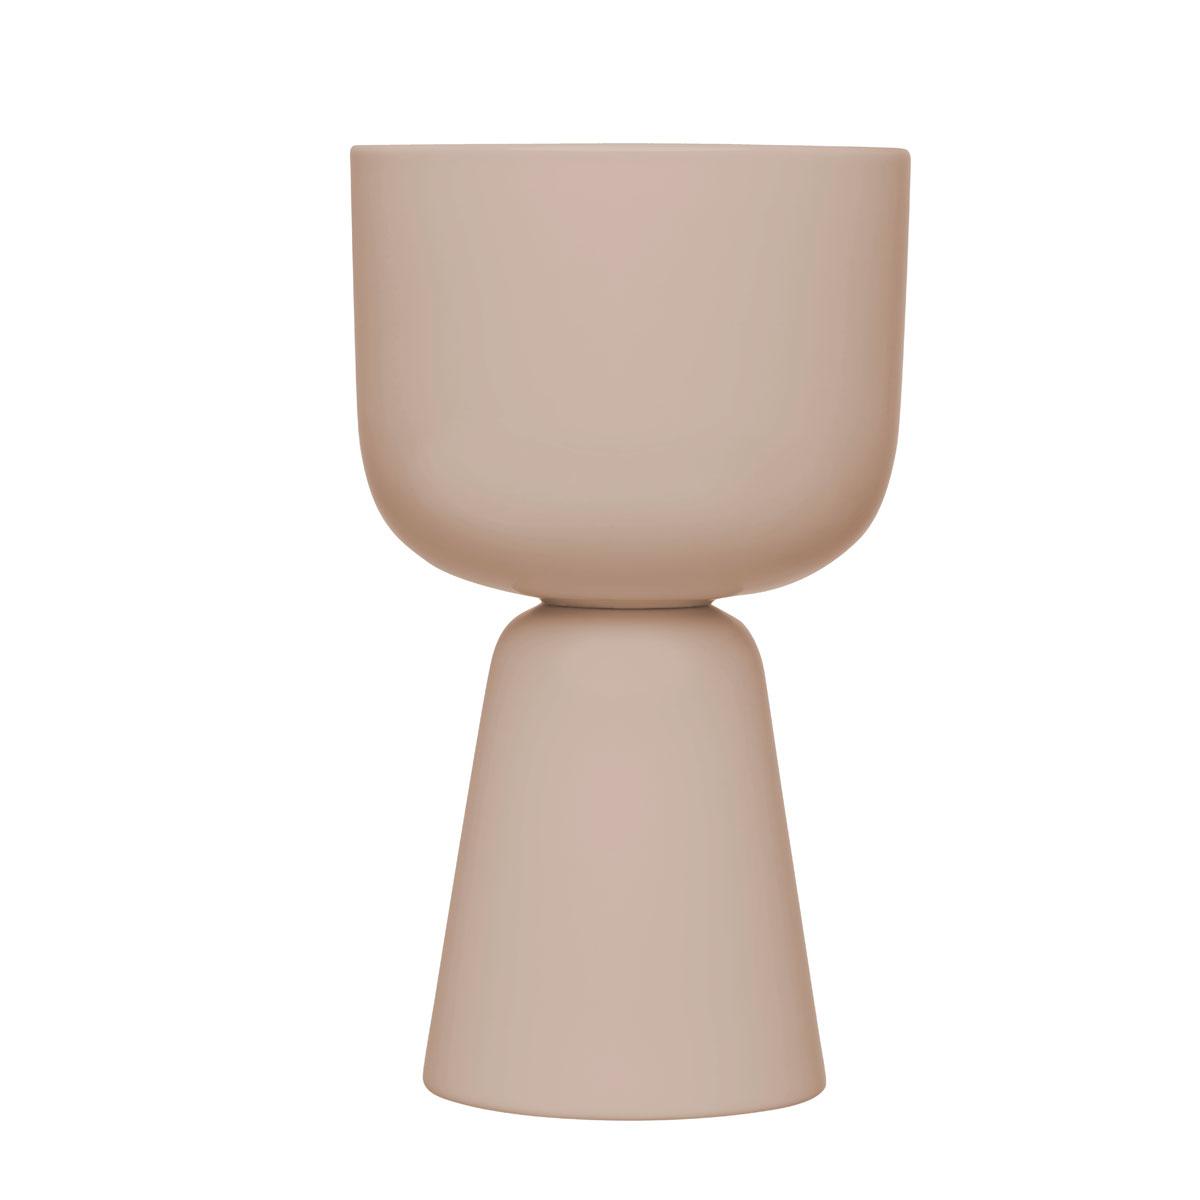 "Iittala Nappula Plant Pot 10.25"" Beige"